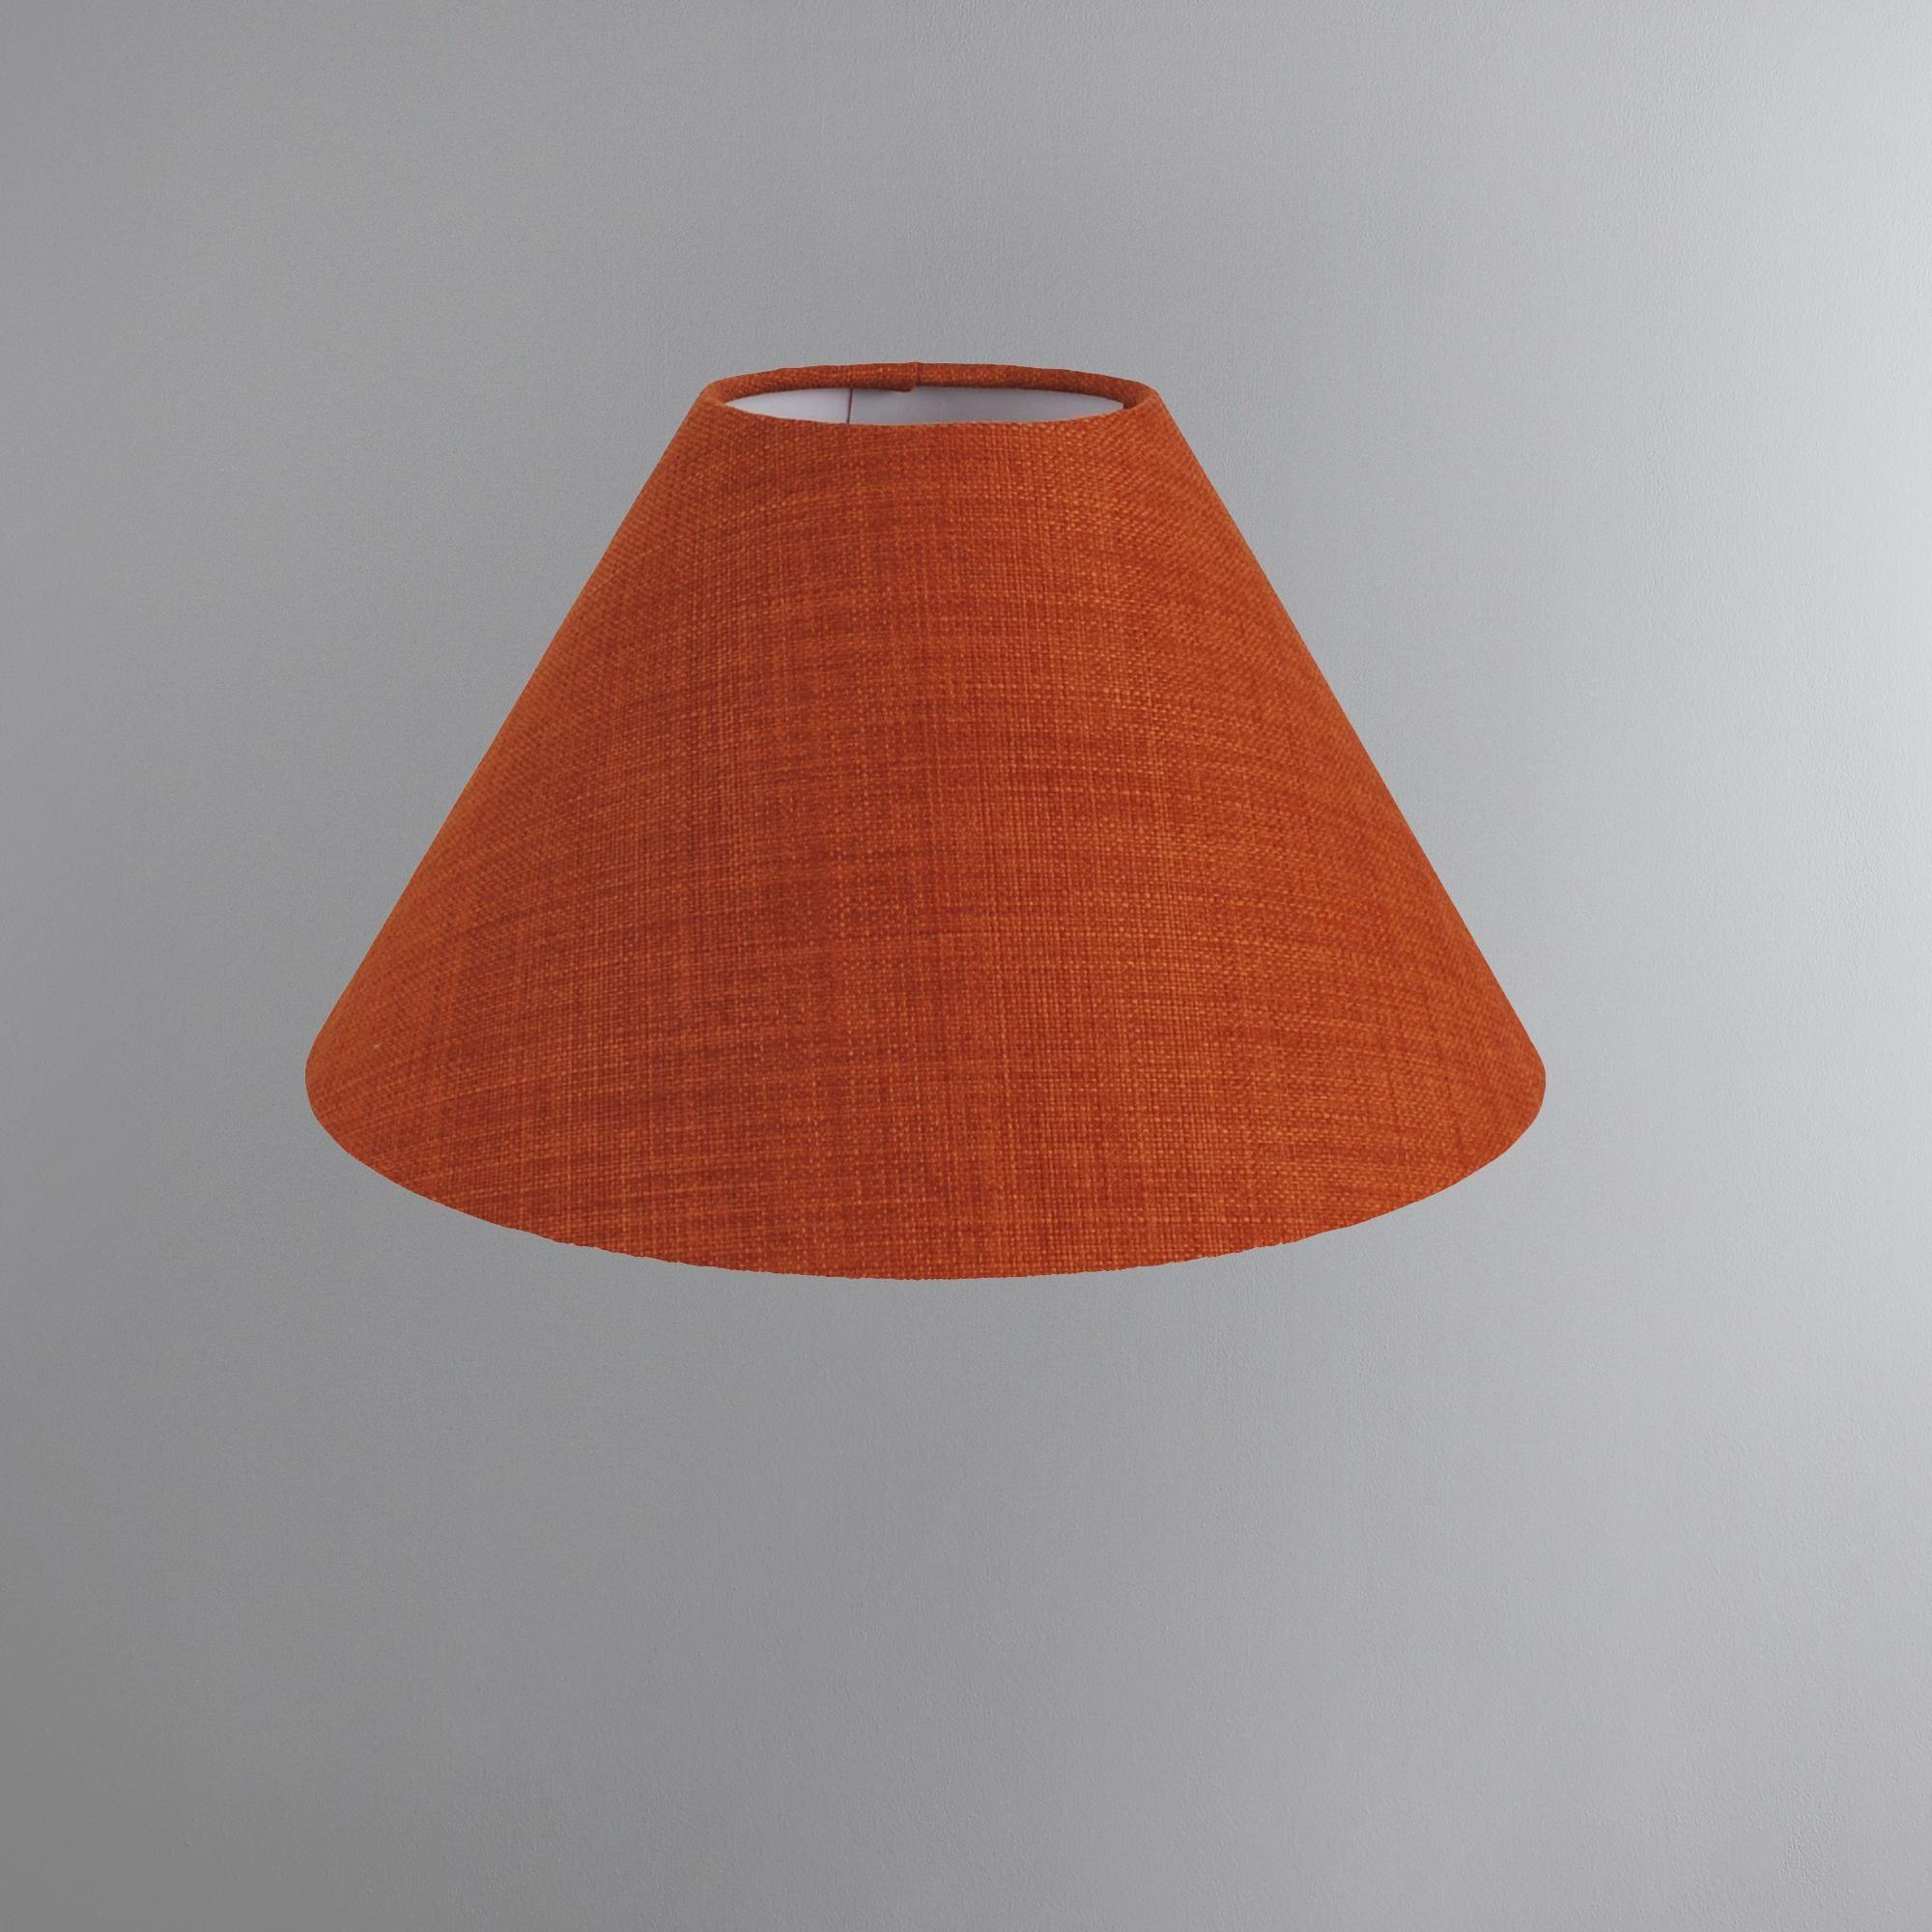 Made To Order 40cm Tapered Shade In 2020 Fabric Lampshade Lamp Shades Shades